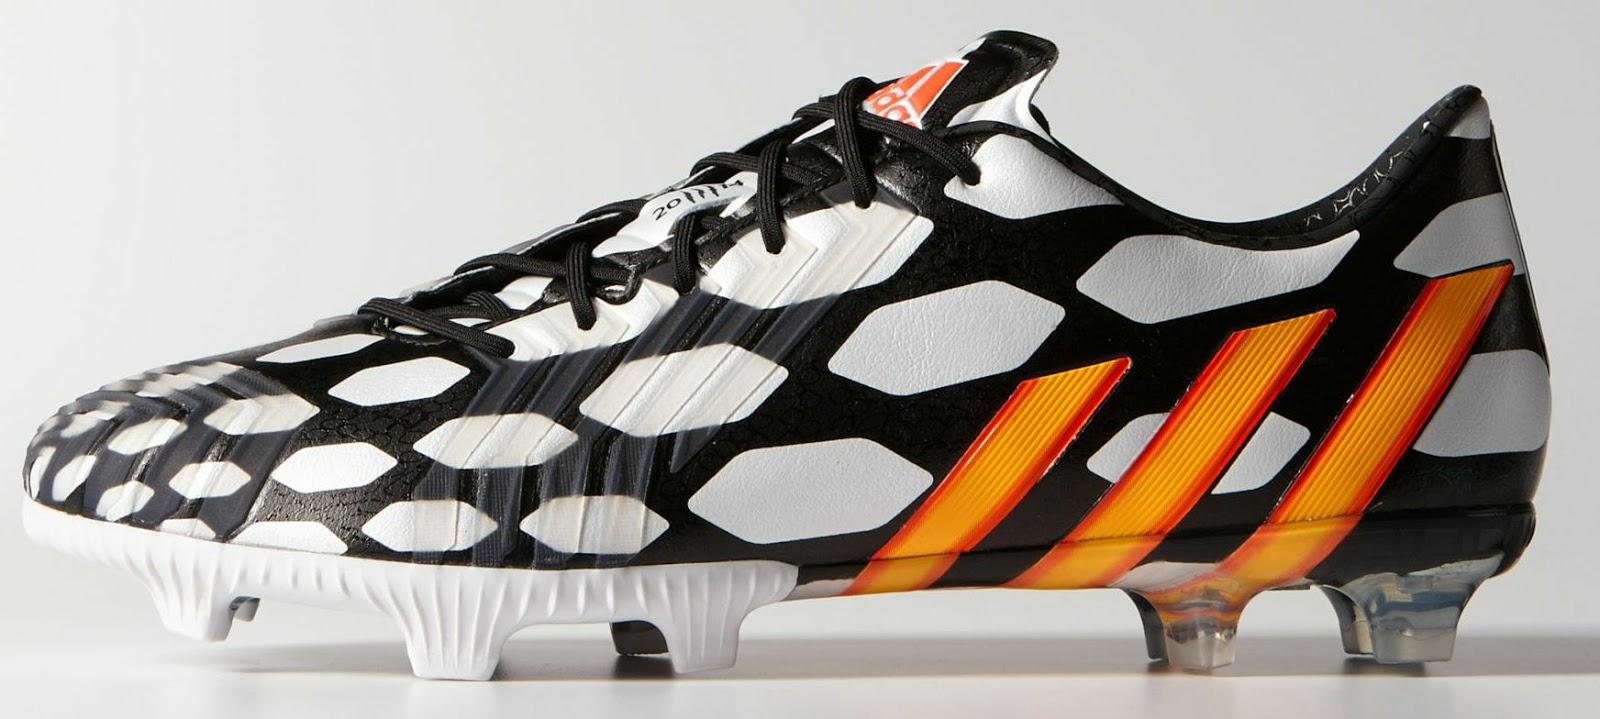 new adidas football shoes 2014 28 images adidas f50